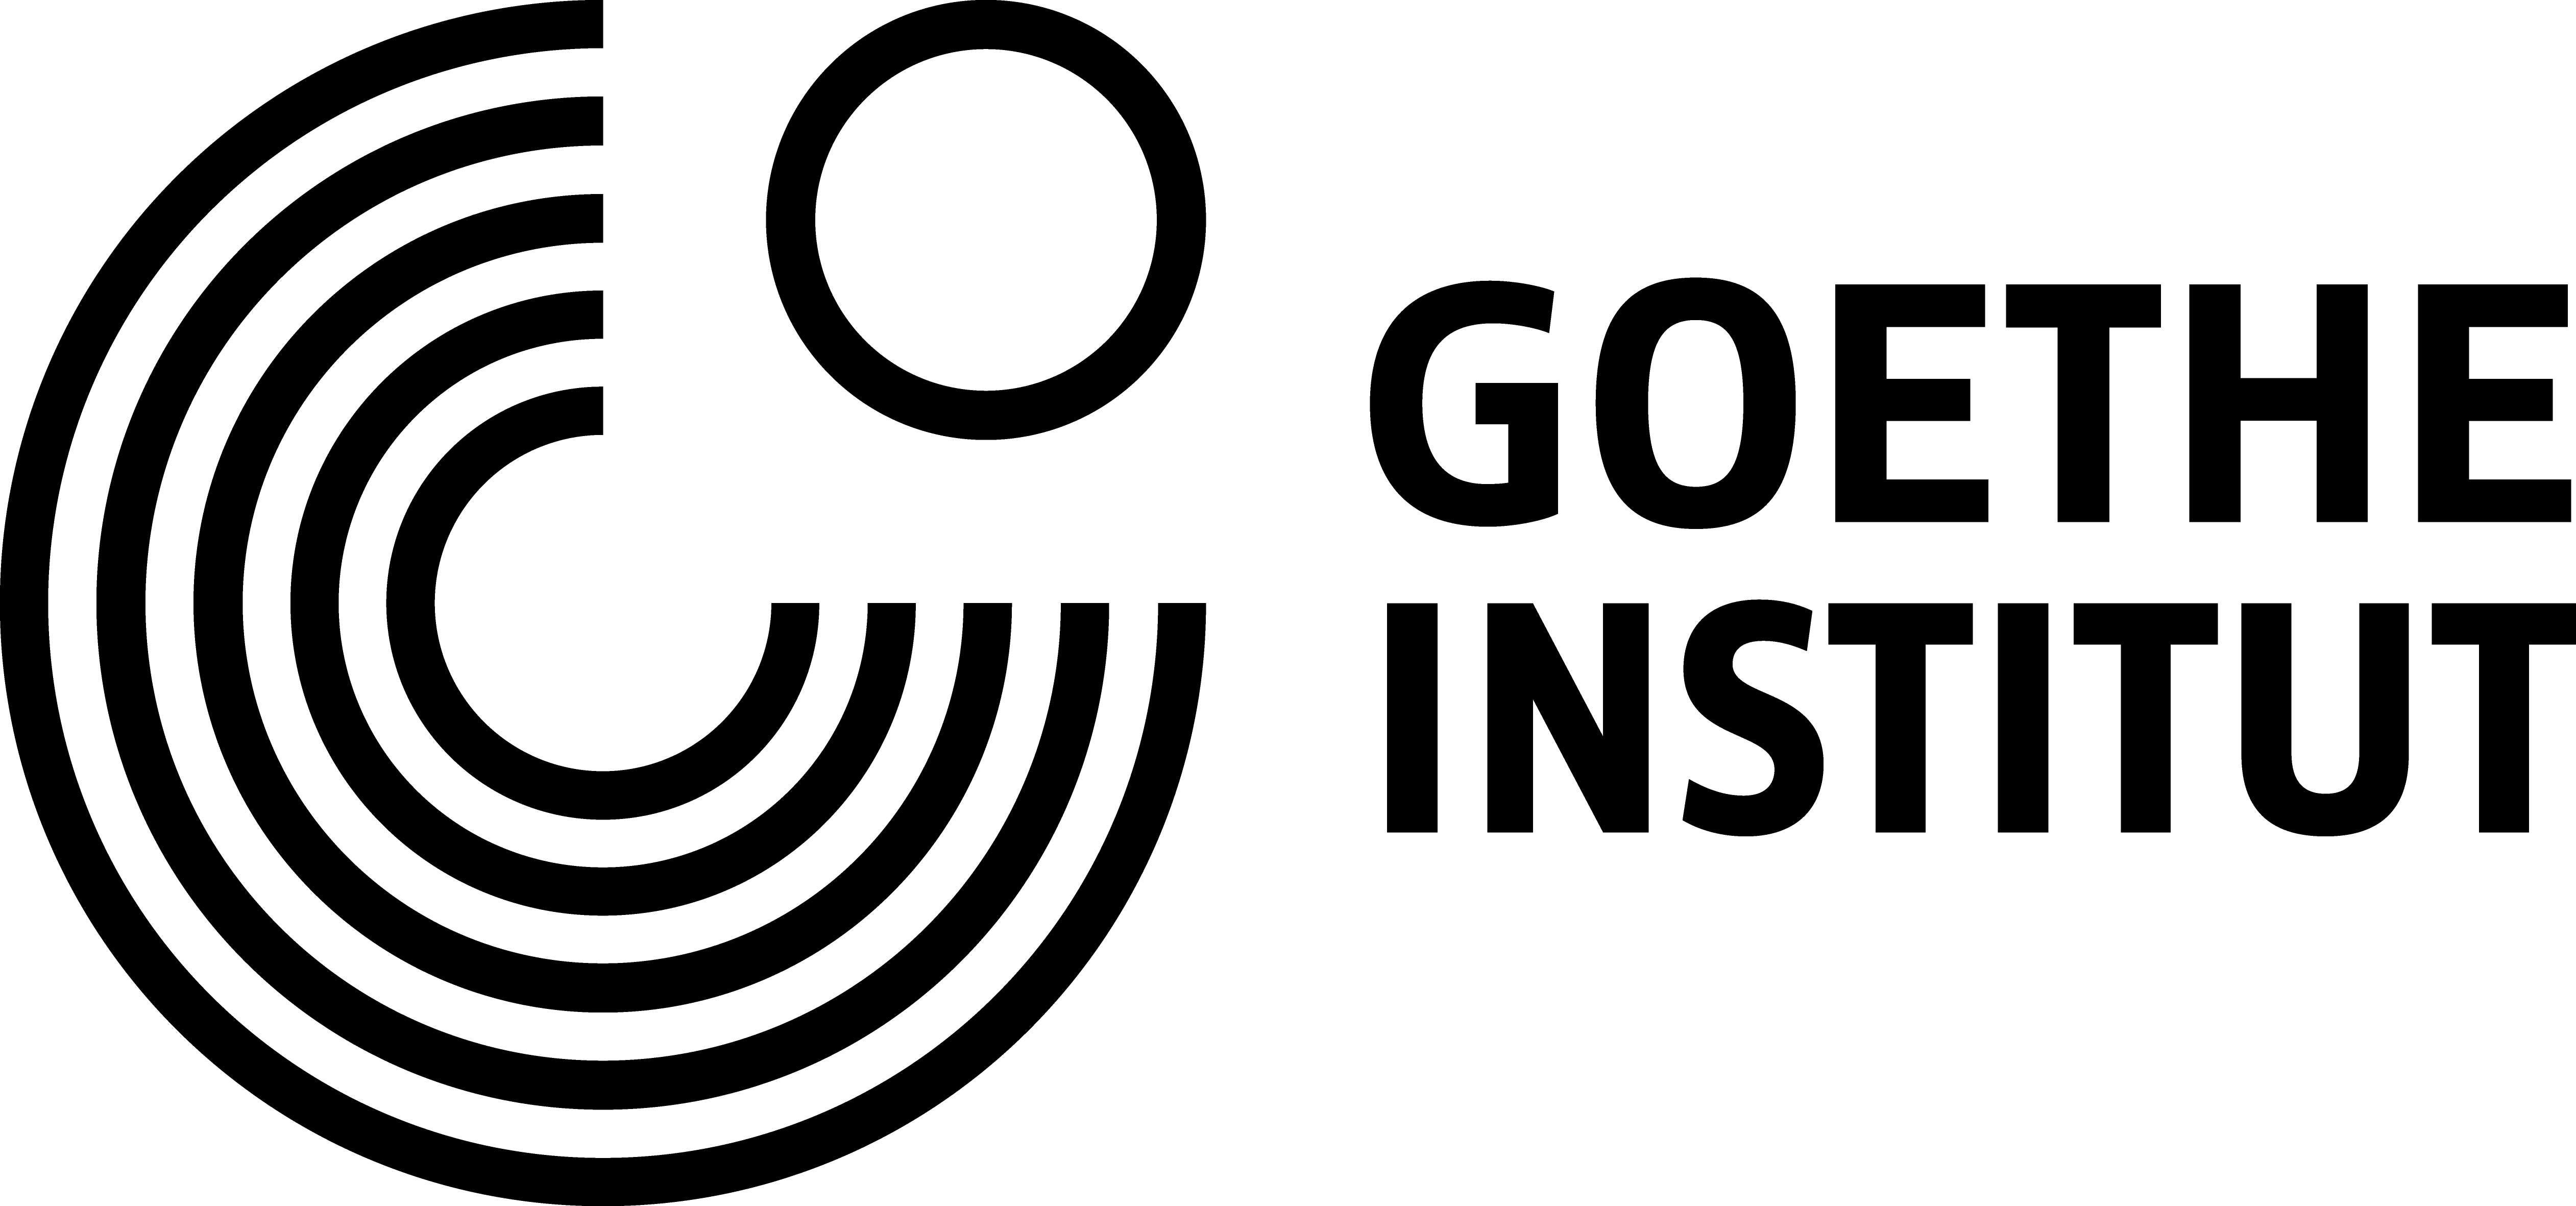 GI_Logo_horizontal_black_sRGB